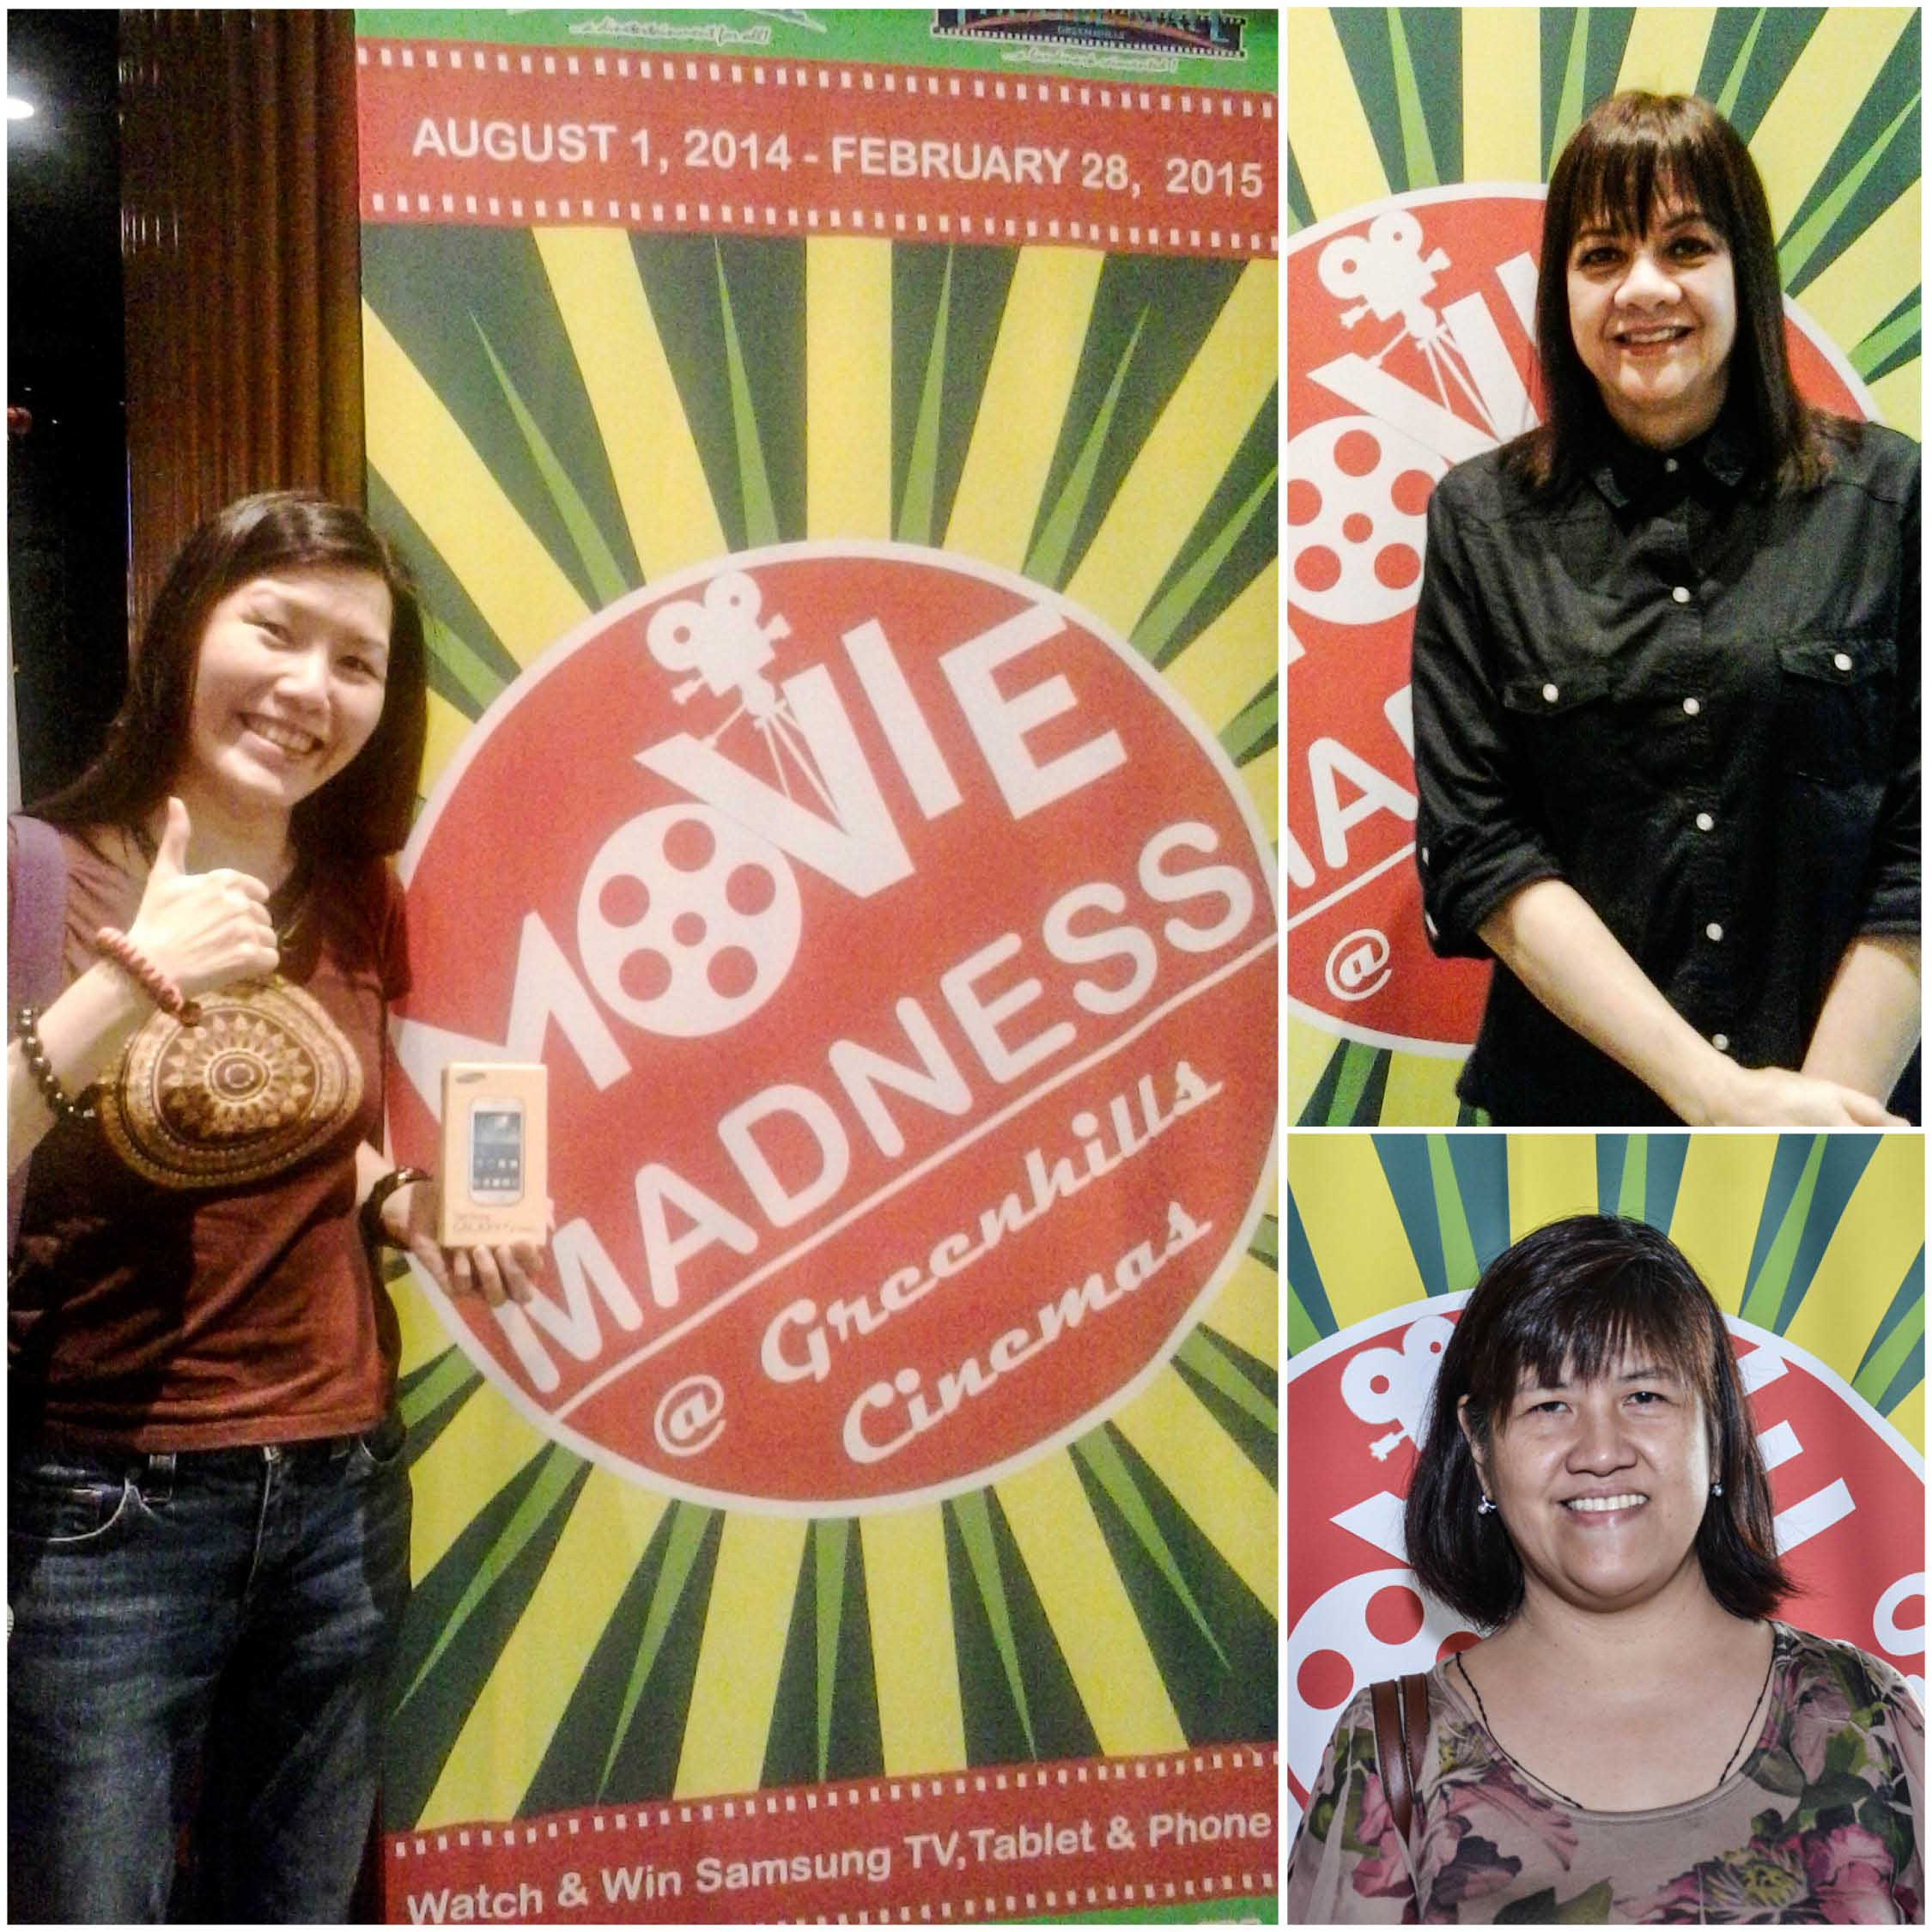 greenhills cinemas hails first movie madness promo winners